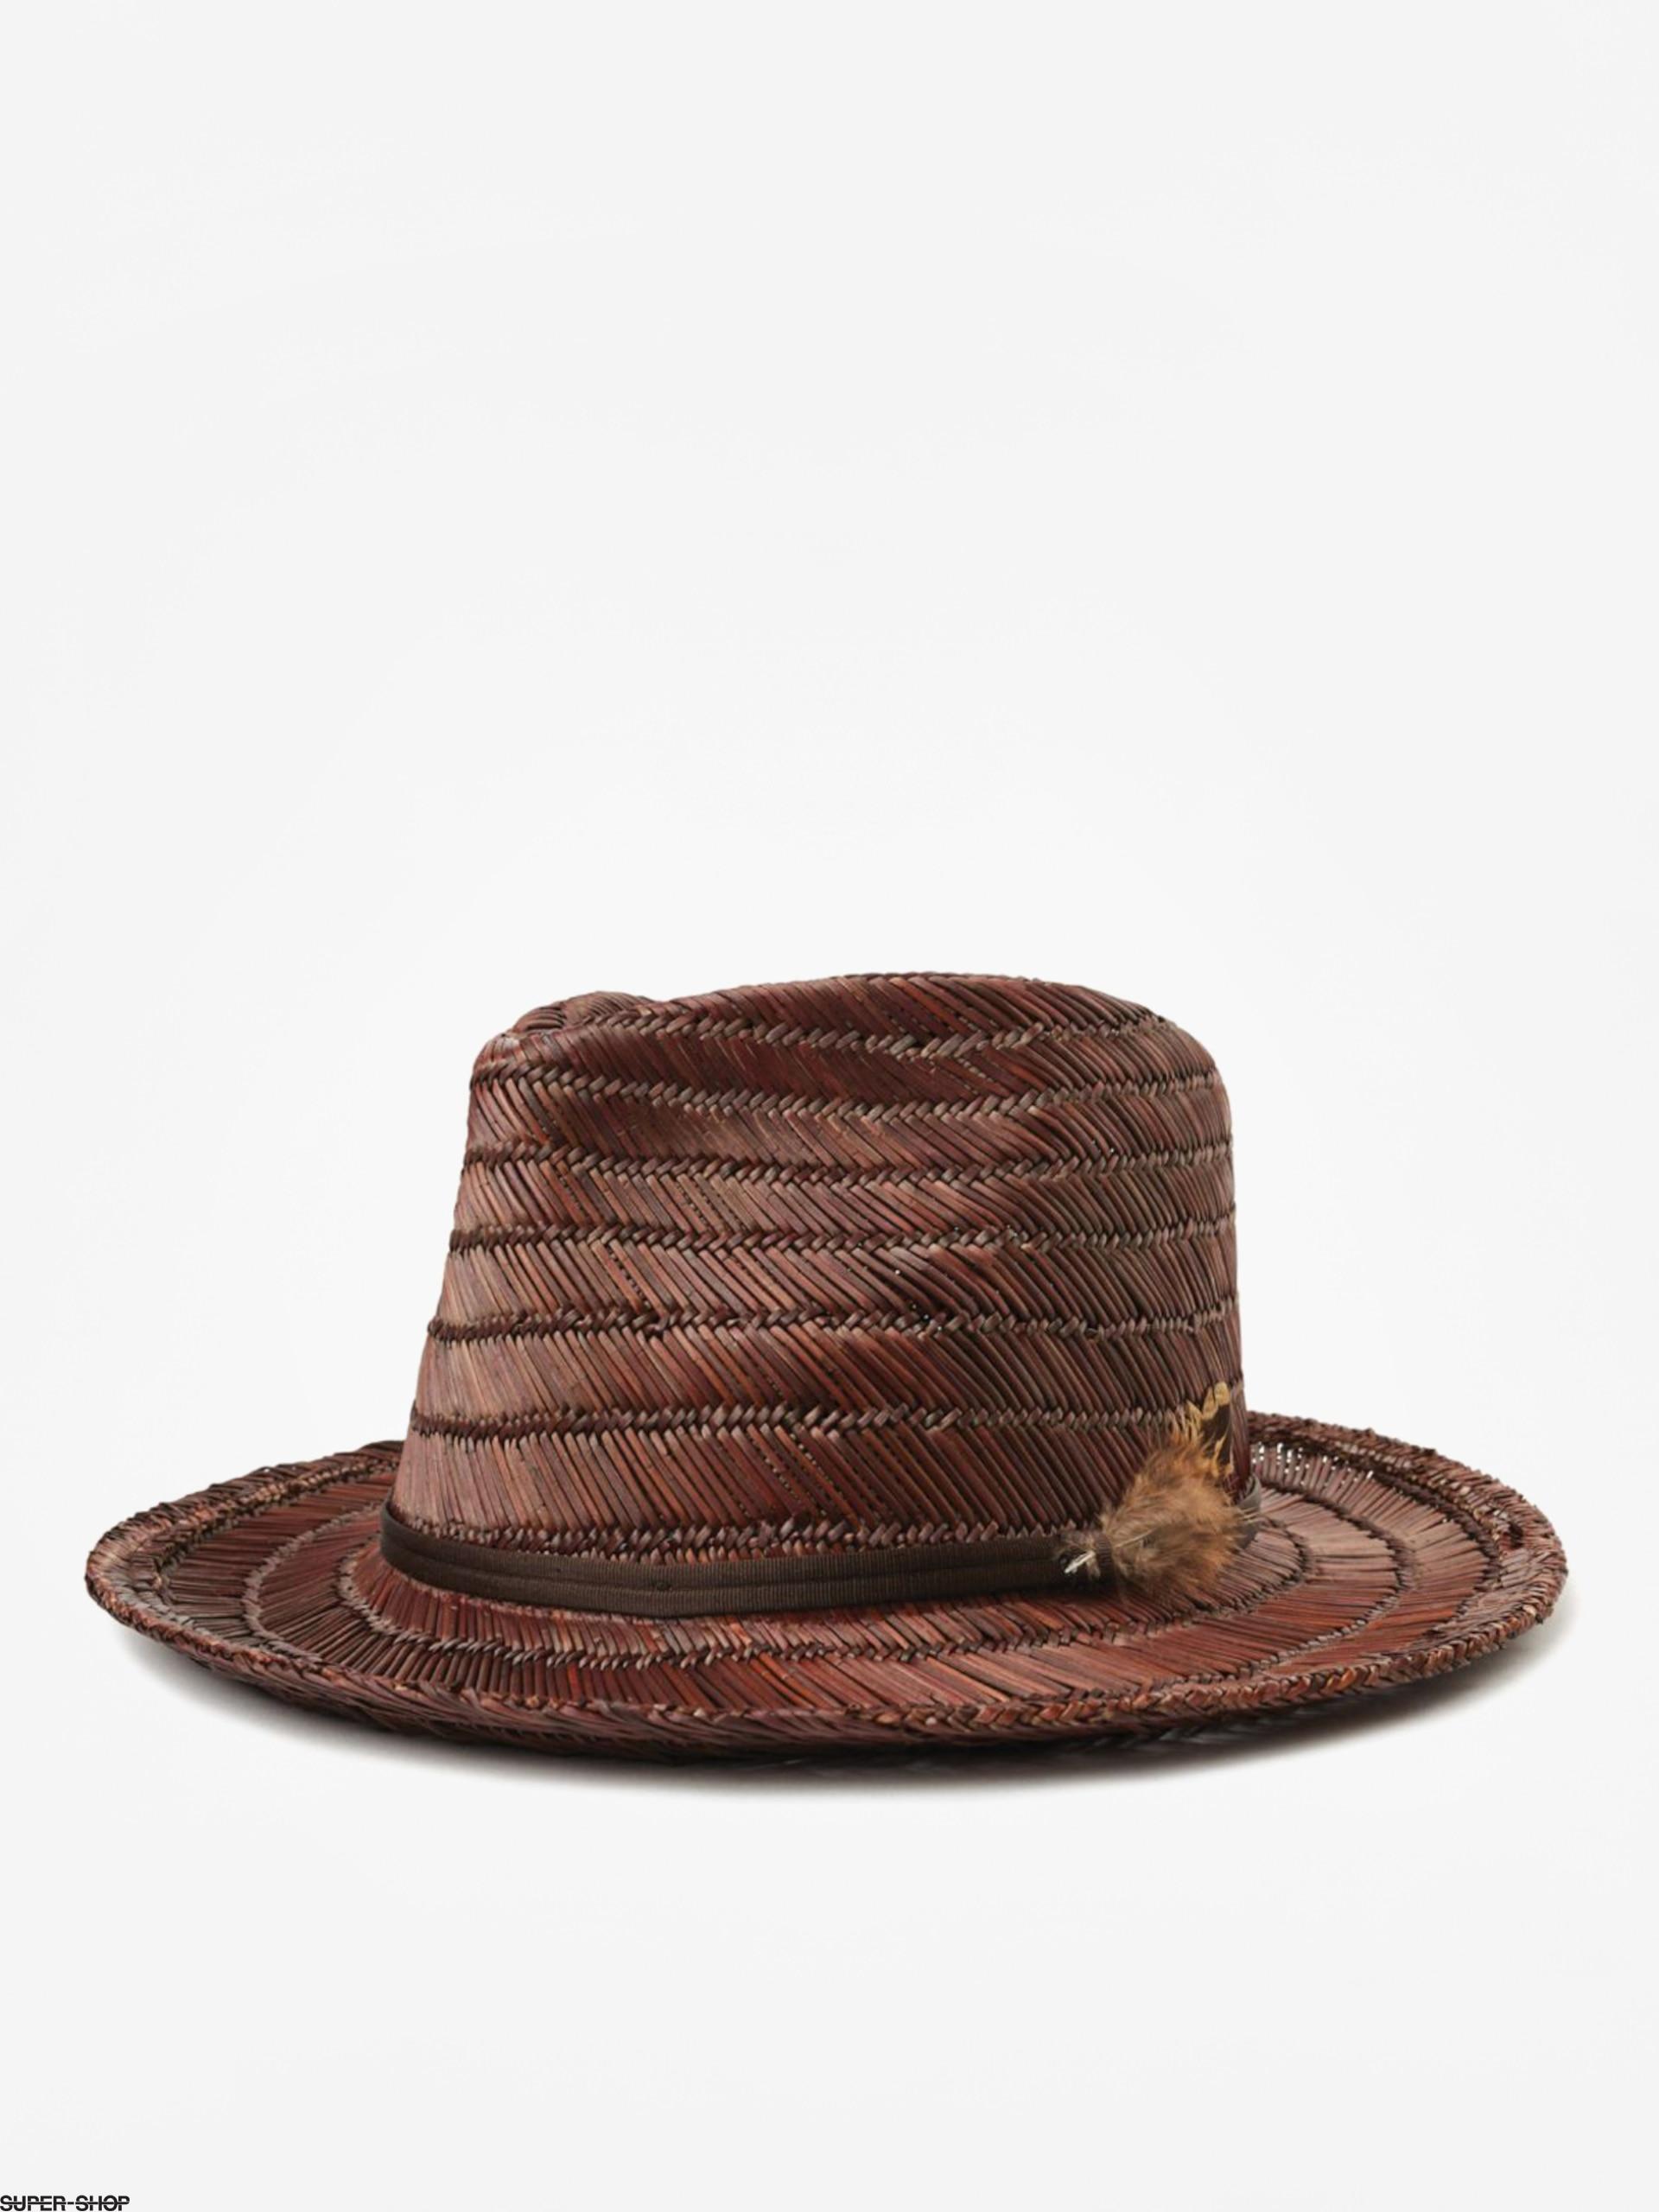 6f400bfbe5f 1019700-w1920-brixton-crosby-ii-fedora-hat-brown-brown.jpg